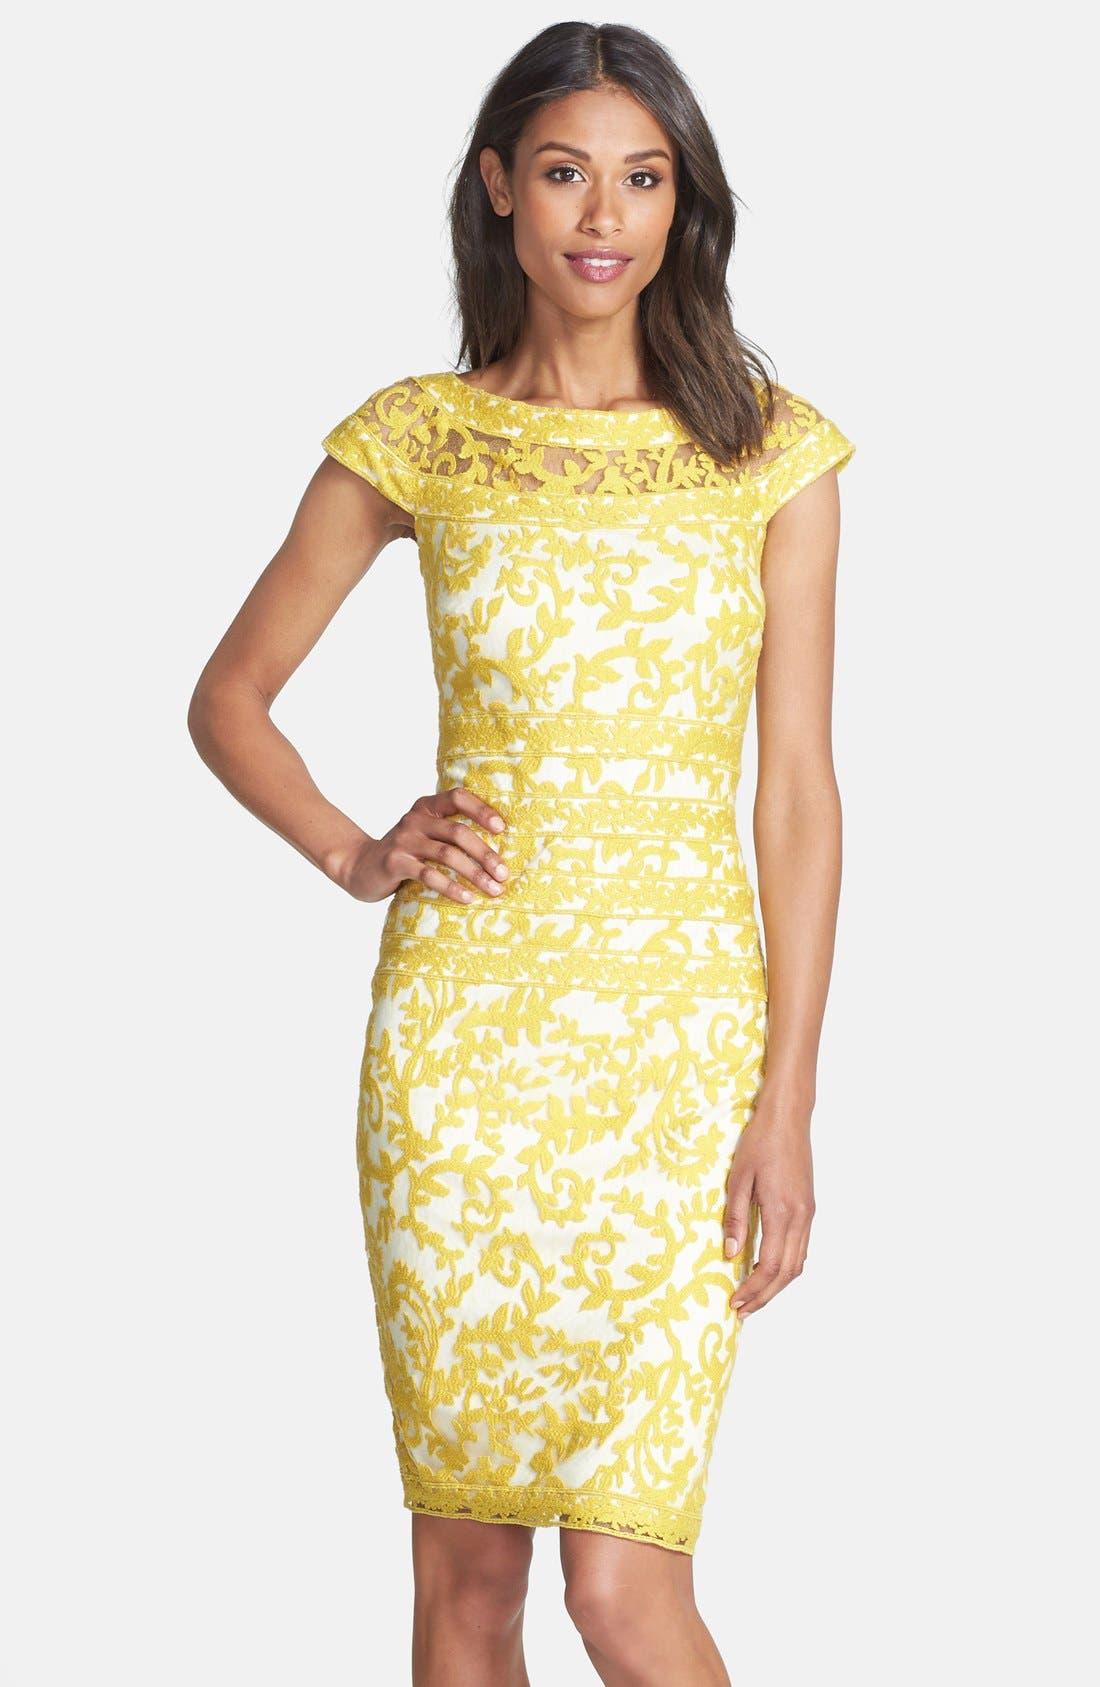 Alternate Image 1 Selected - Tadashi Shoji Embroidered Lace Sheath Dress (Regular & Petite)